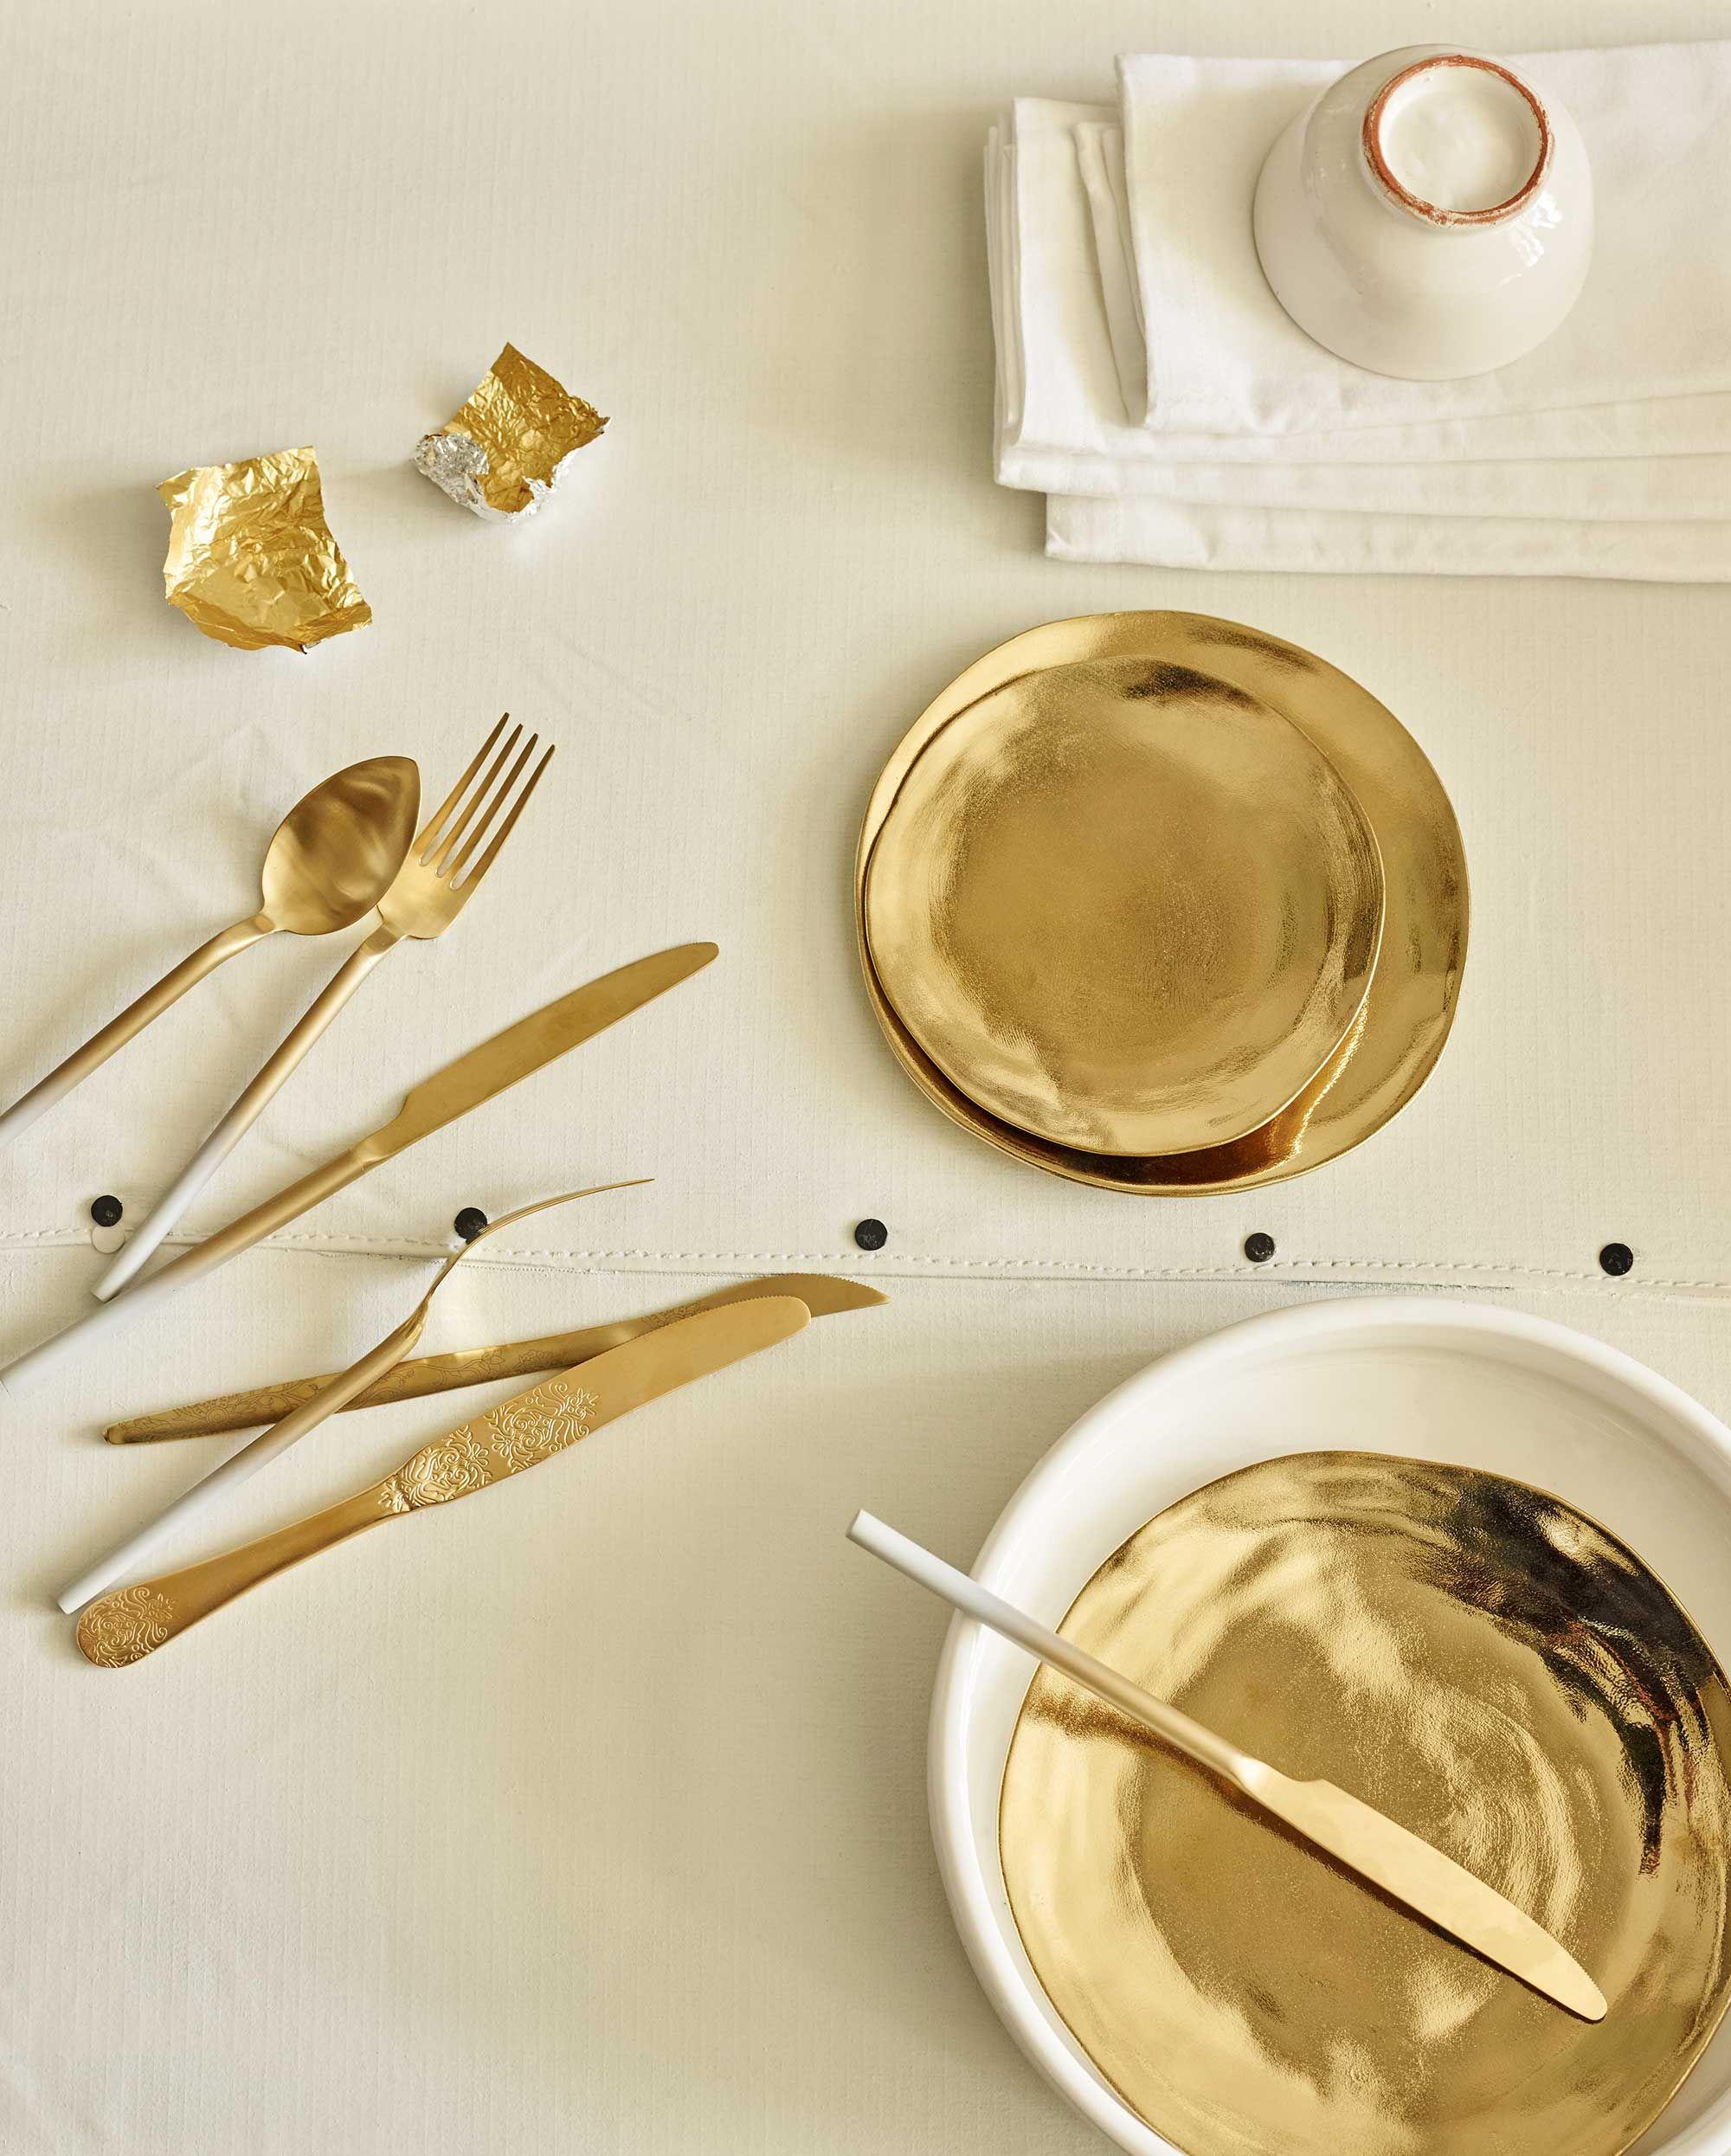 goud servies | golden tableware | vtwonen 07-2016 | Photography Tjitske van leeuwen | Styling Marianne Luning